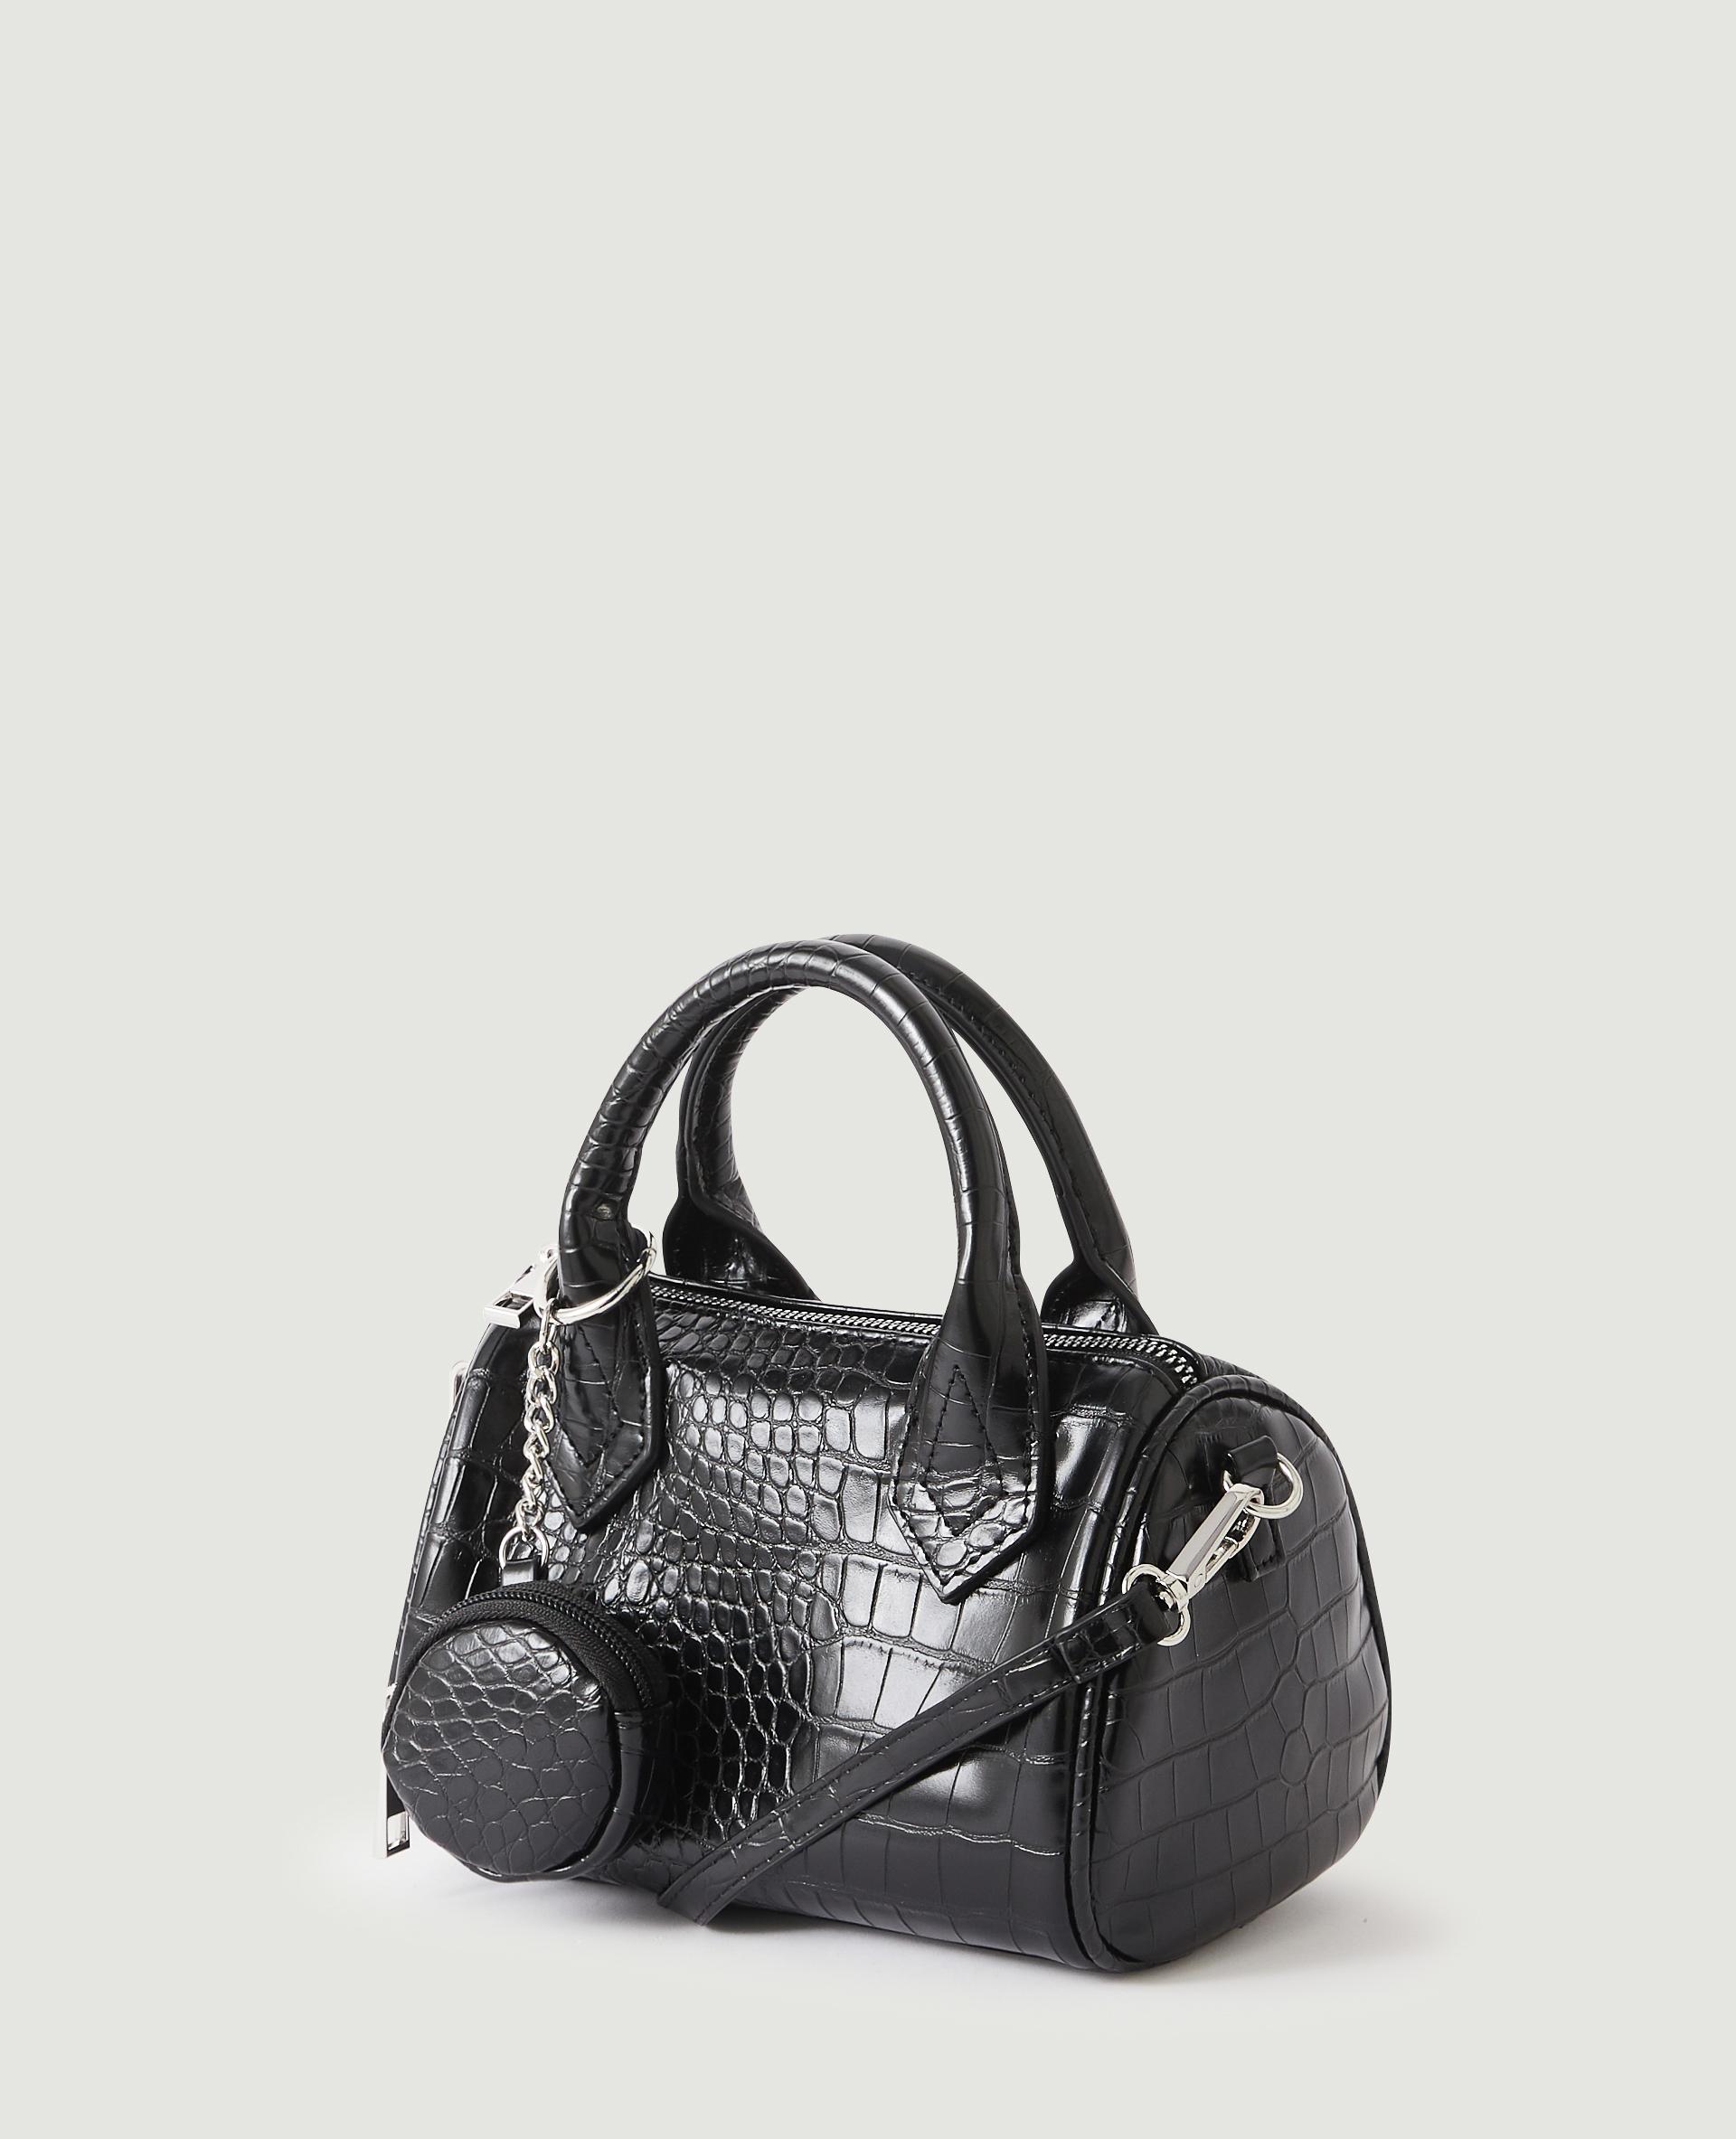 Mini sac à main croco avec pochette noir - Pimkie